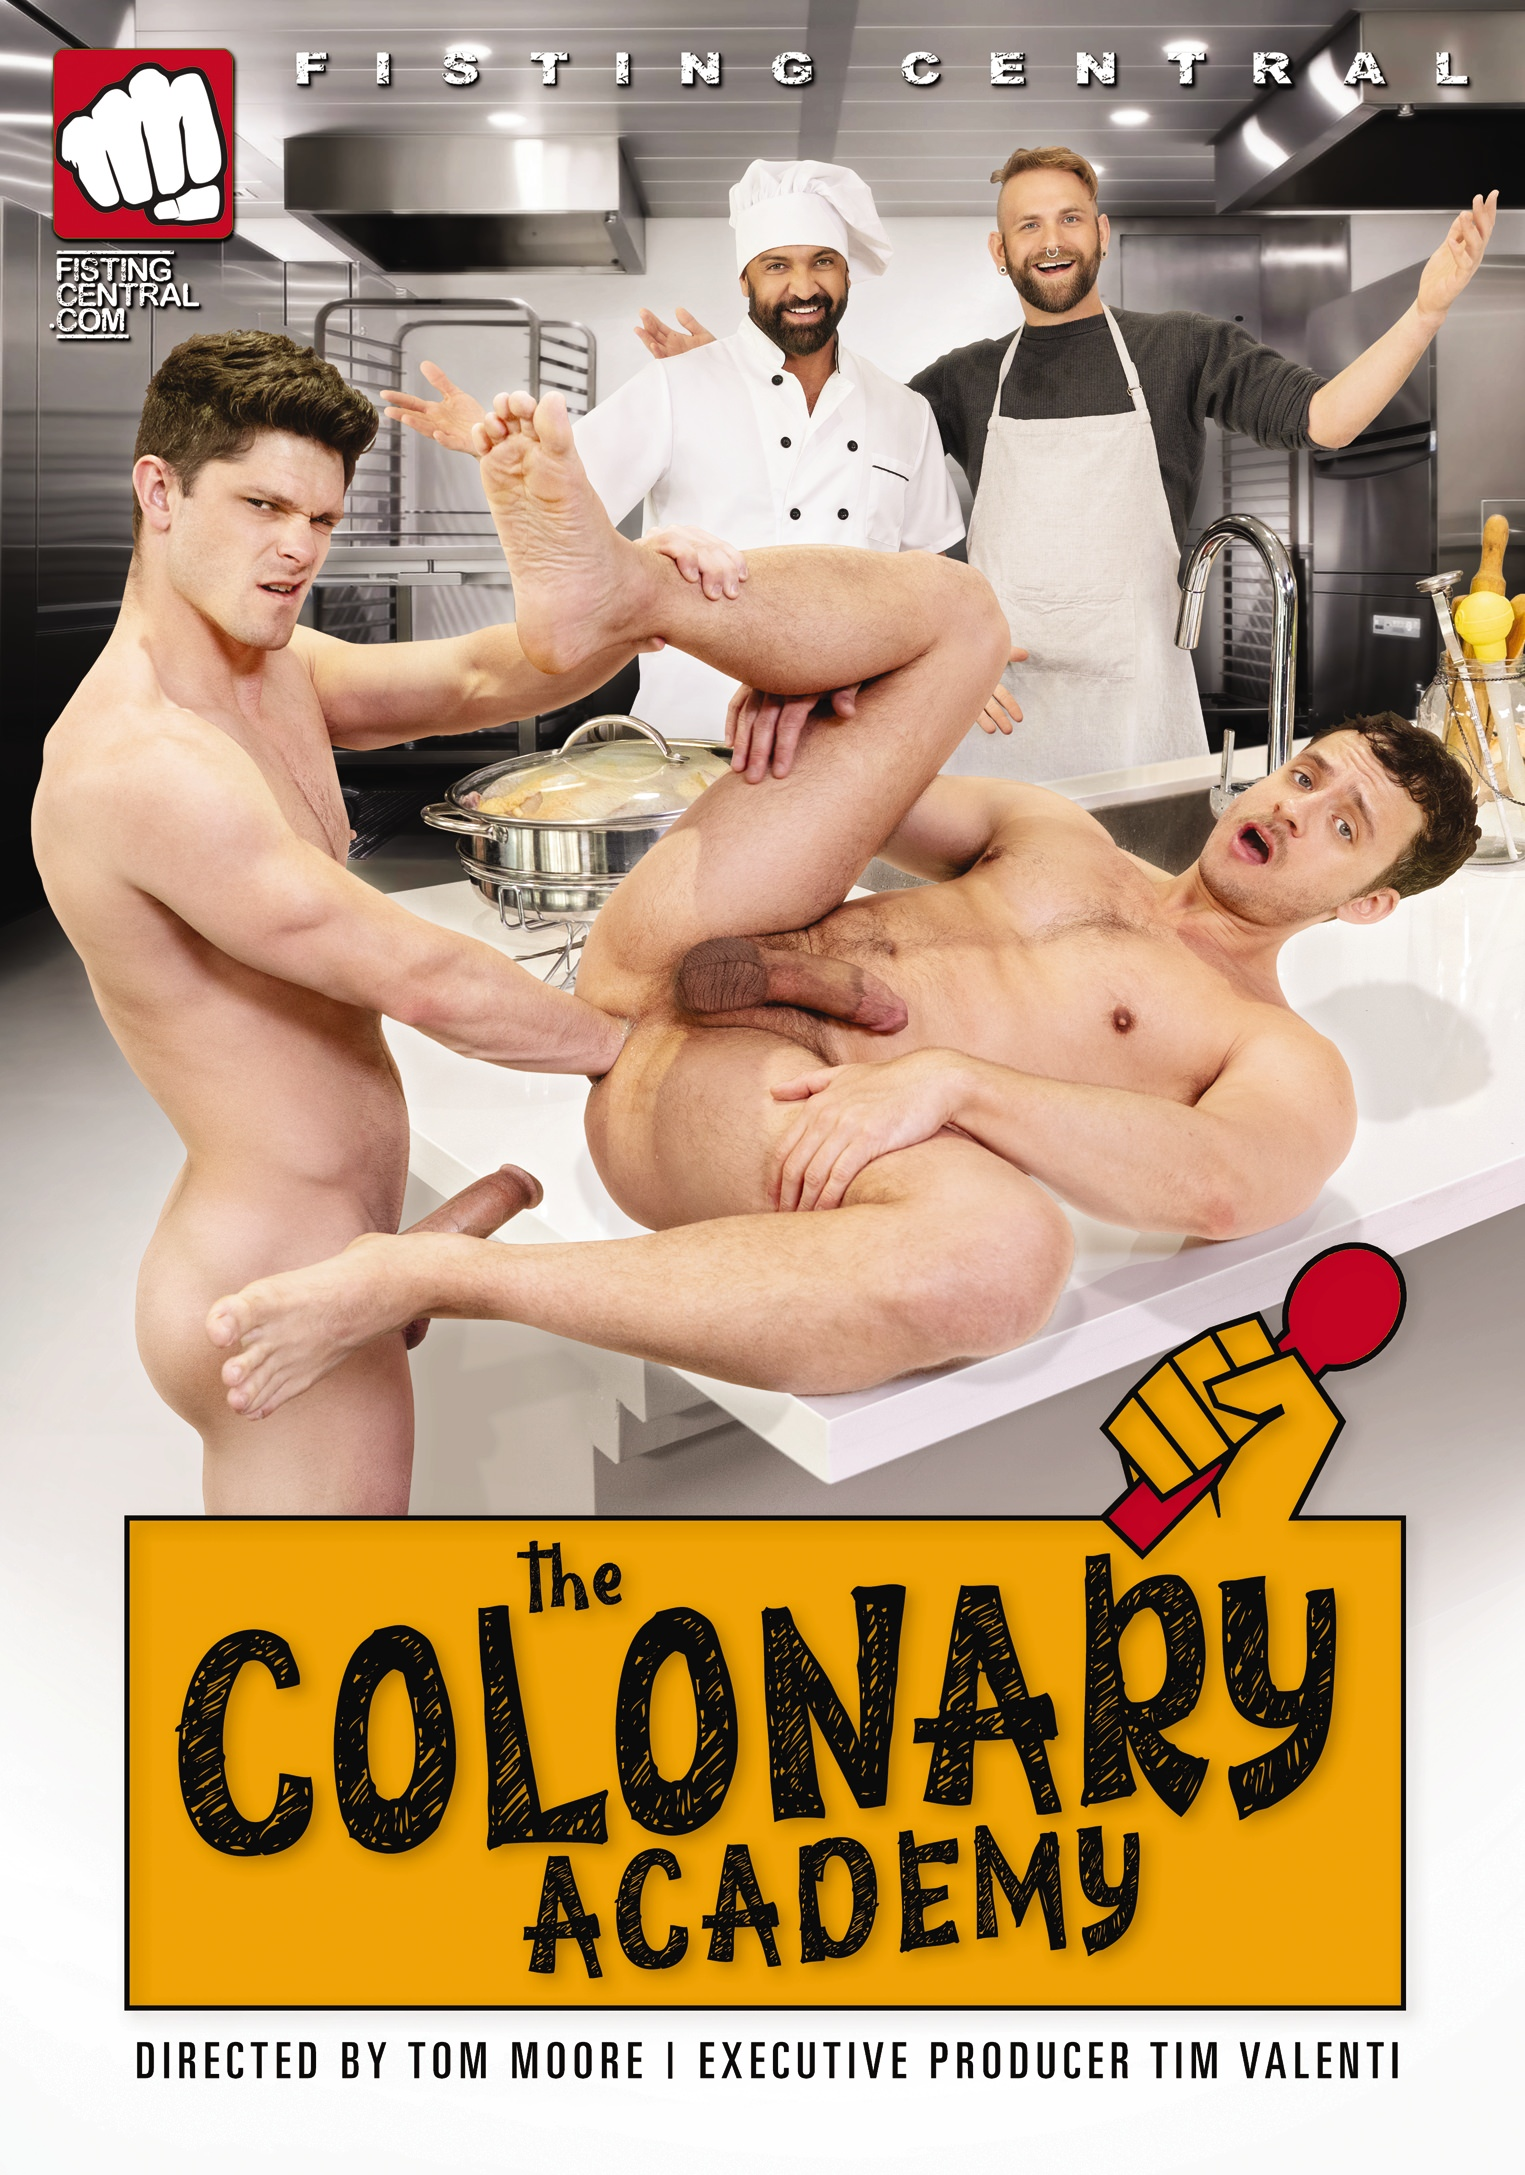 The Colonary Academy